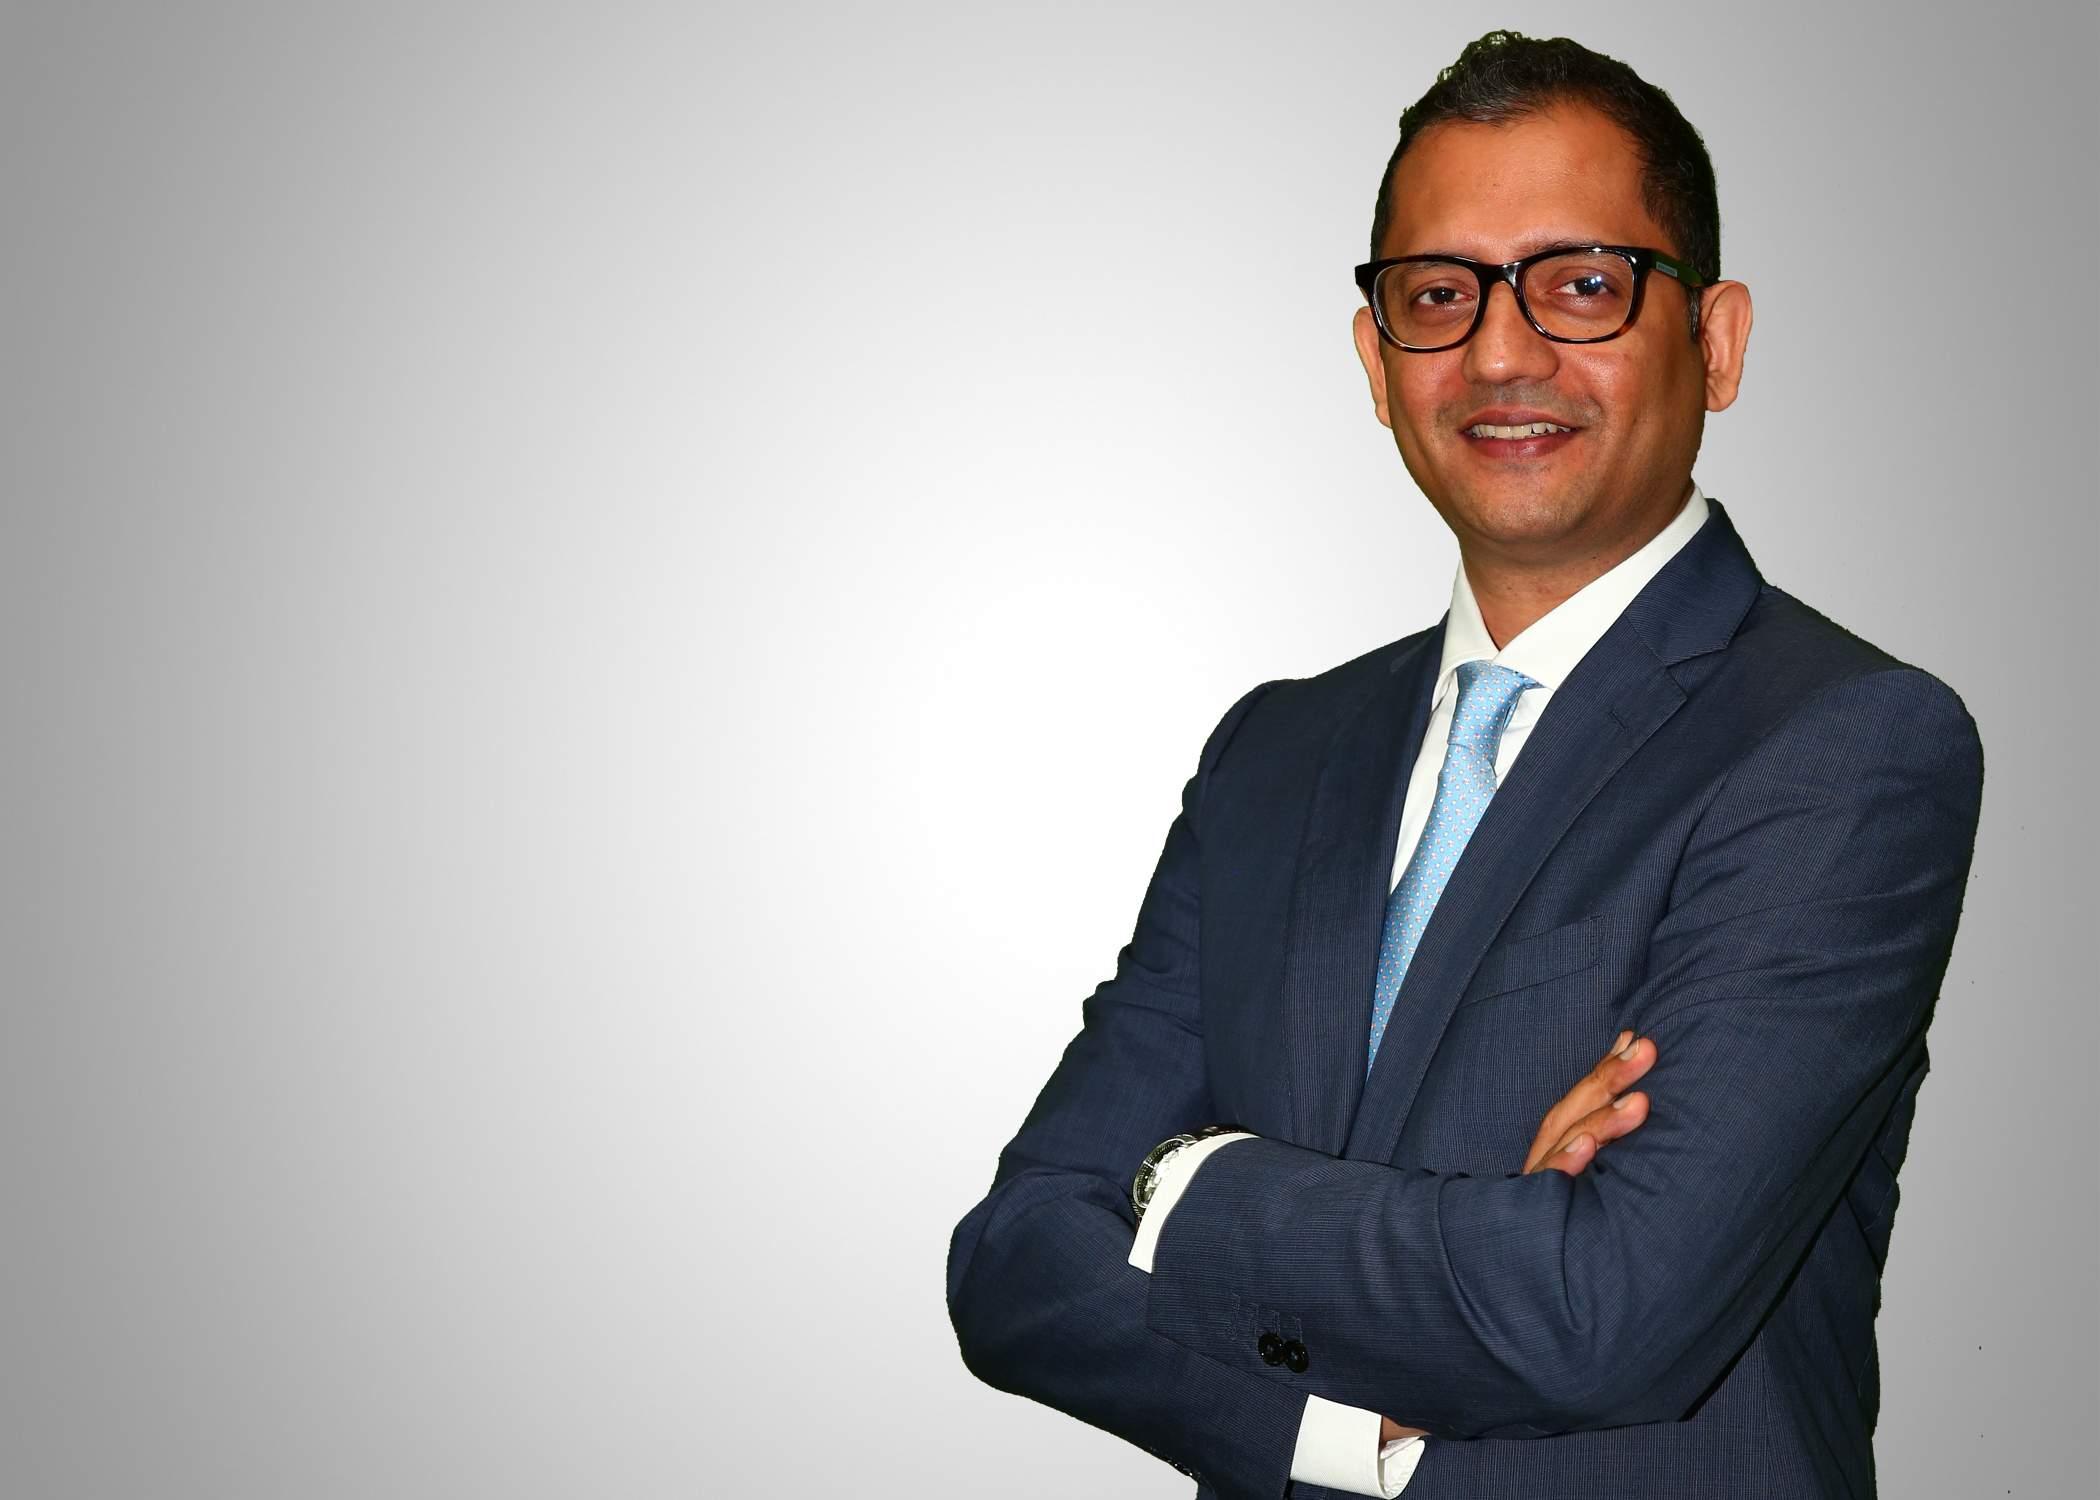 Ambrish Sinha, CEO, MeritTrac